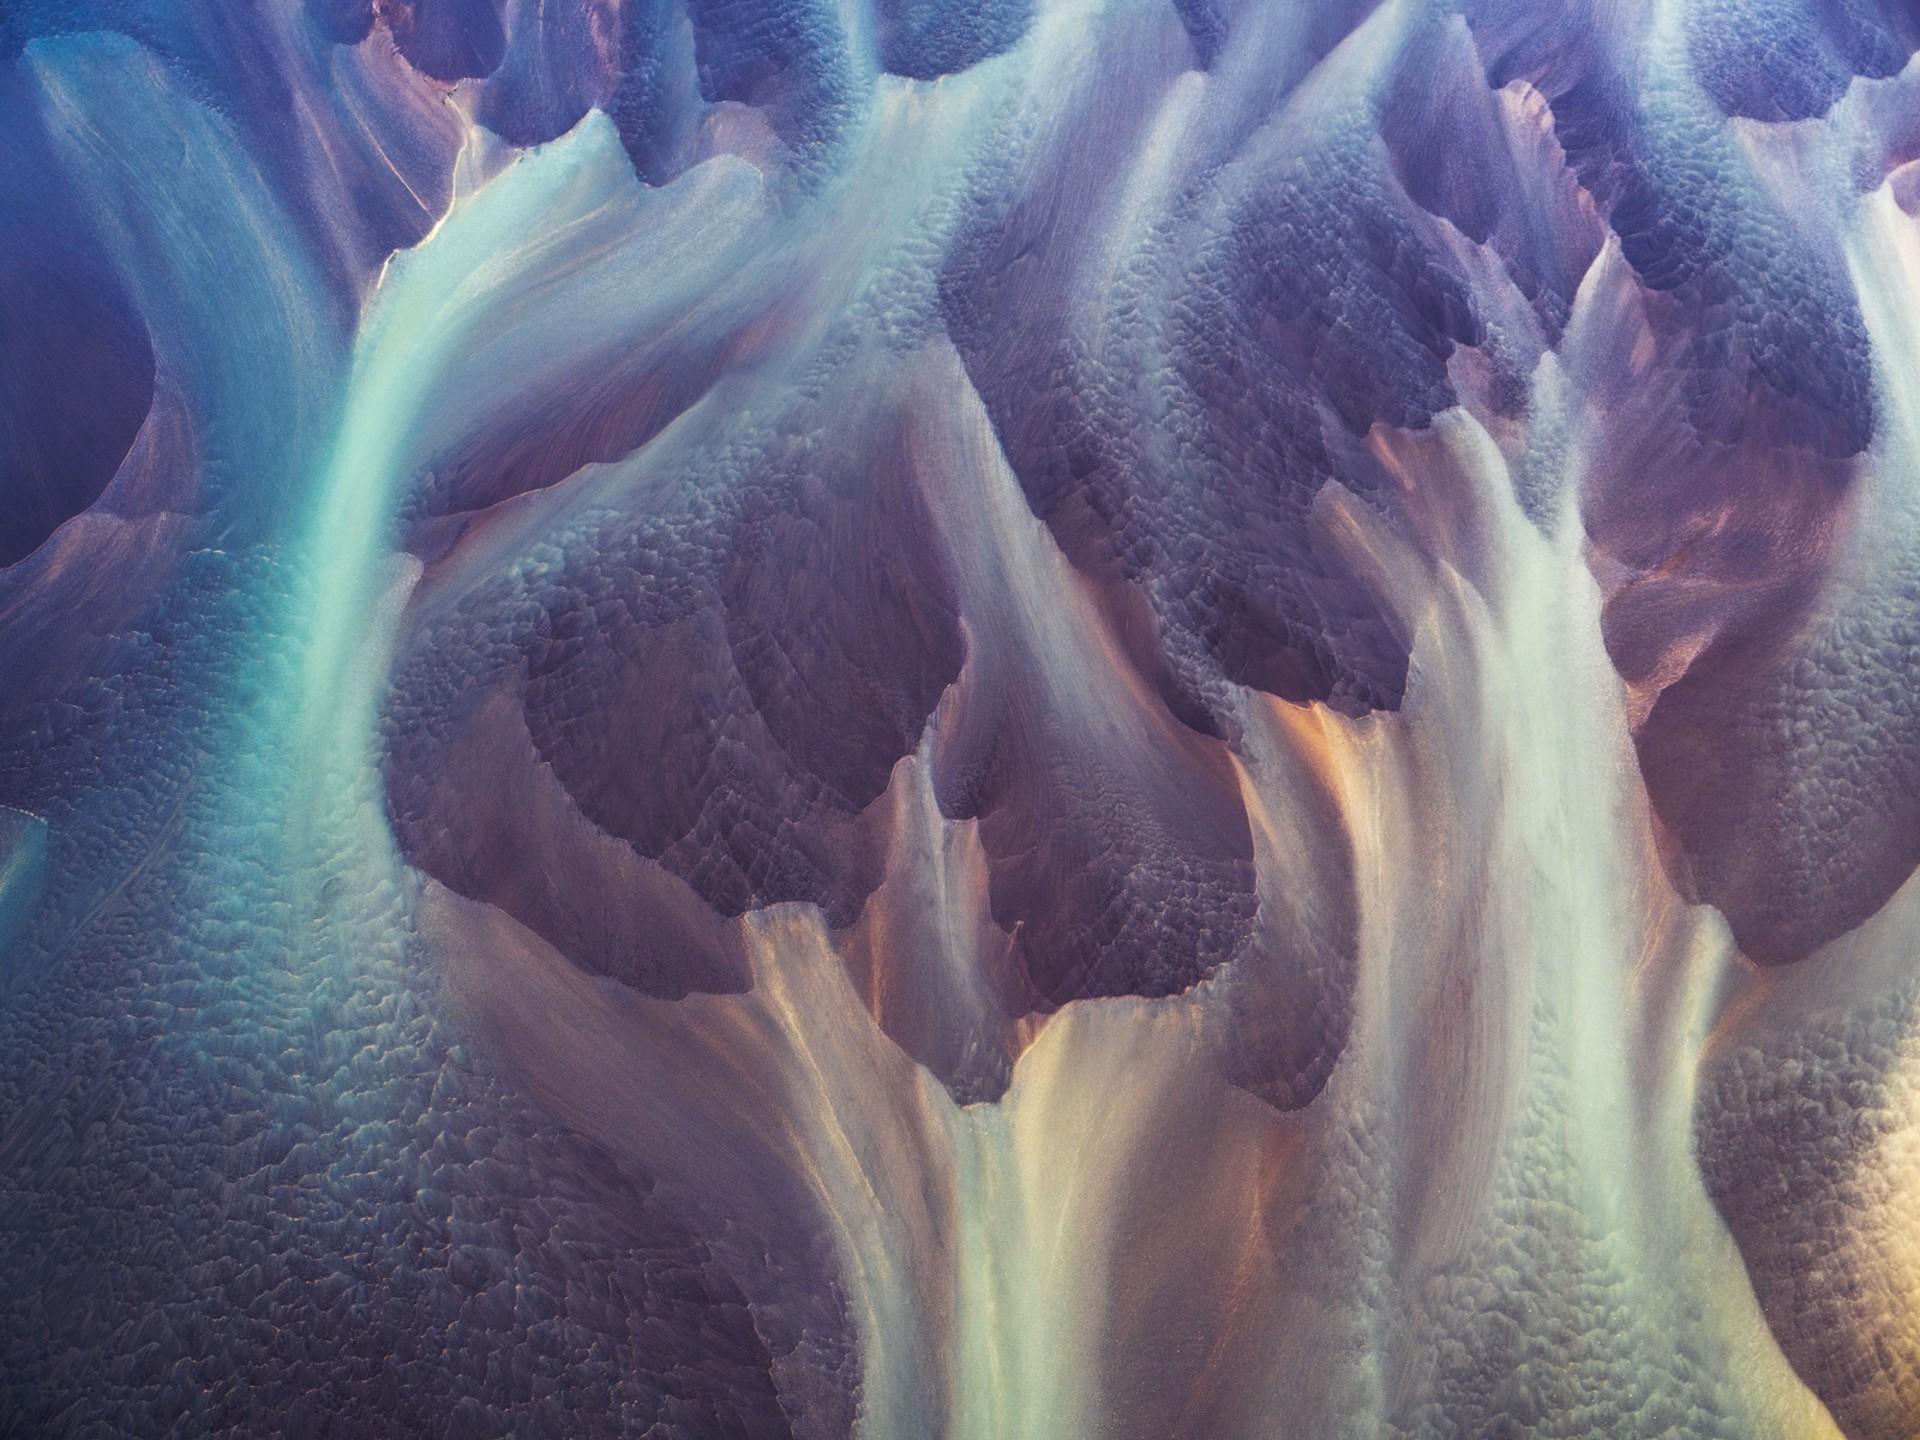 Eyes Wide Shut, Vatnajokull Glacier, Iceland/ Aerial Photo  Ed 1/10 by Dinesh Boaz